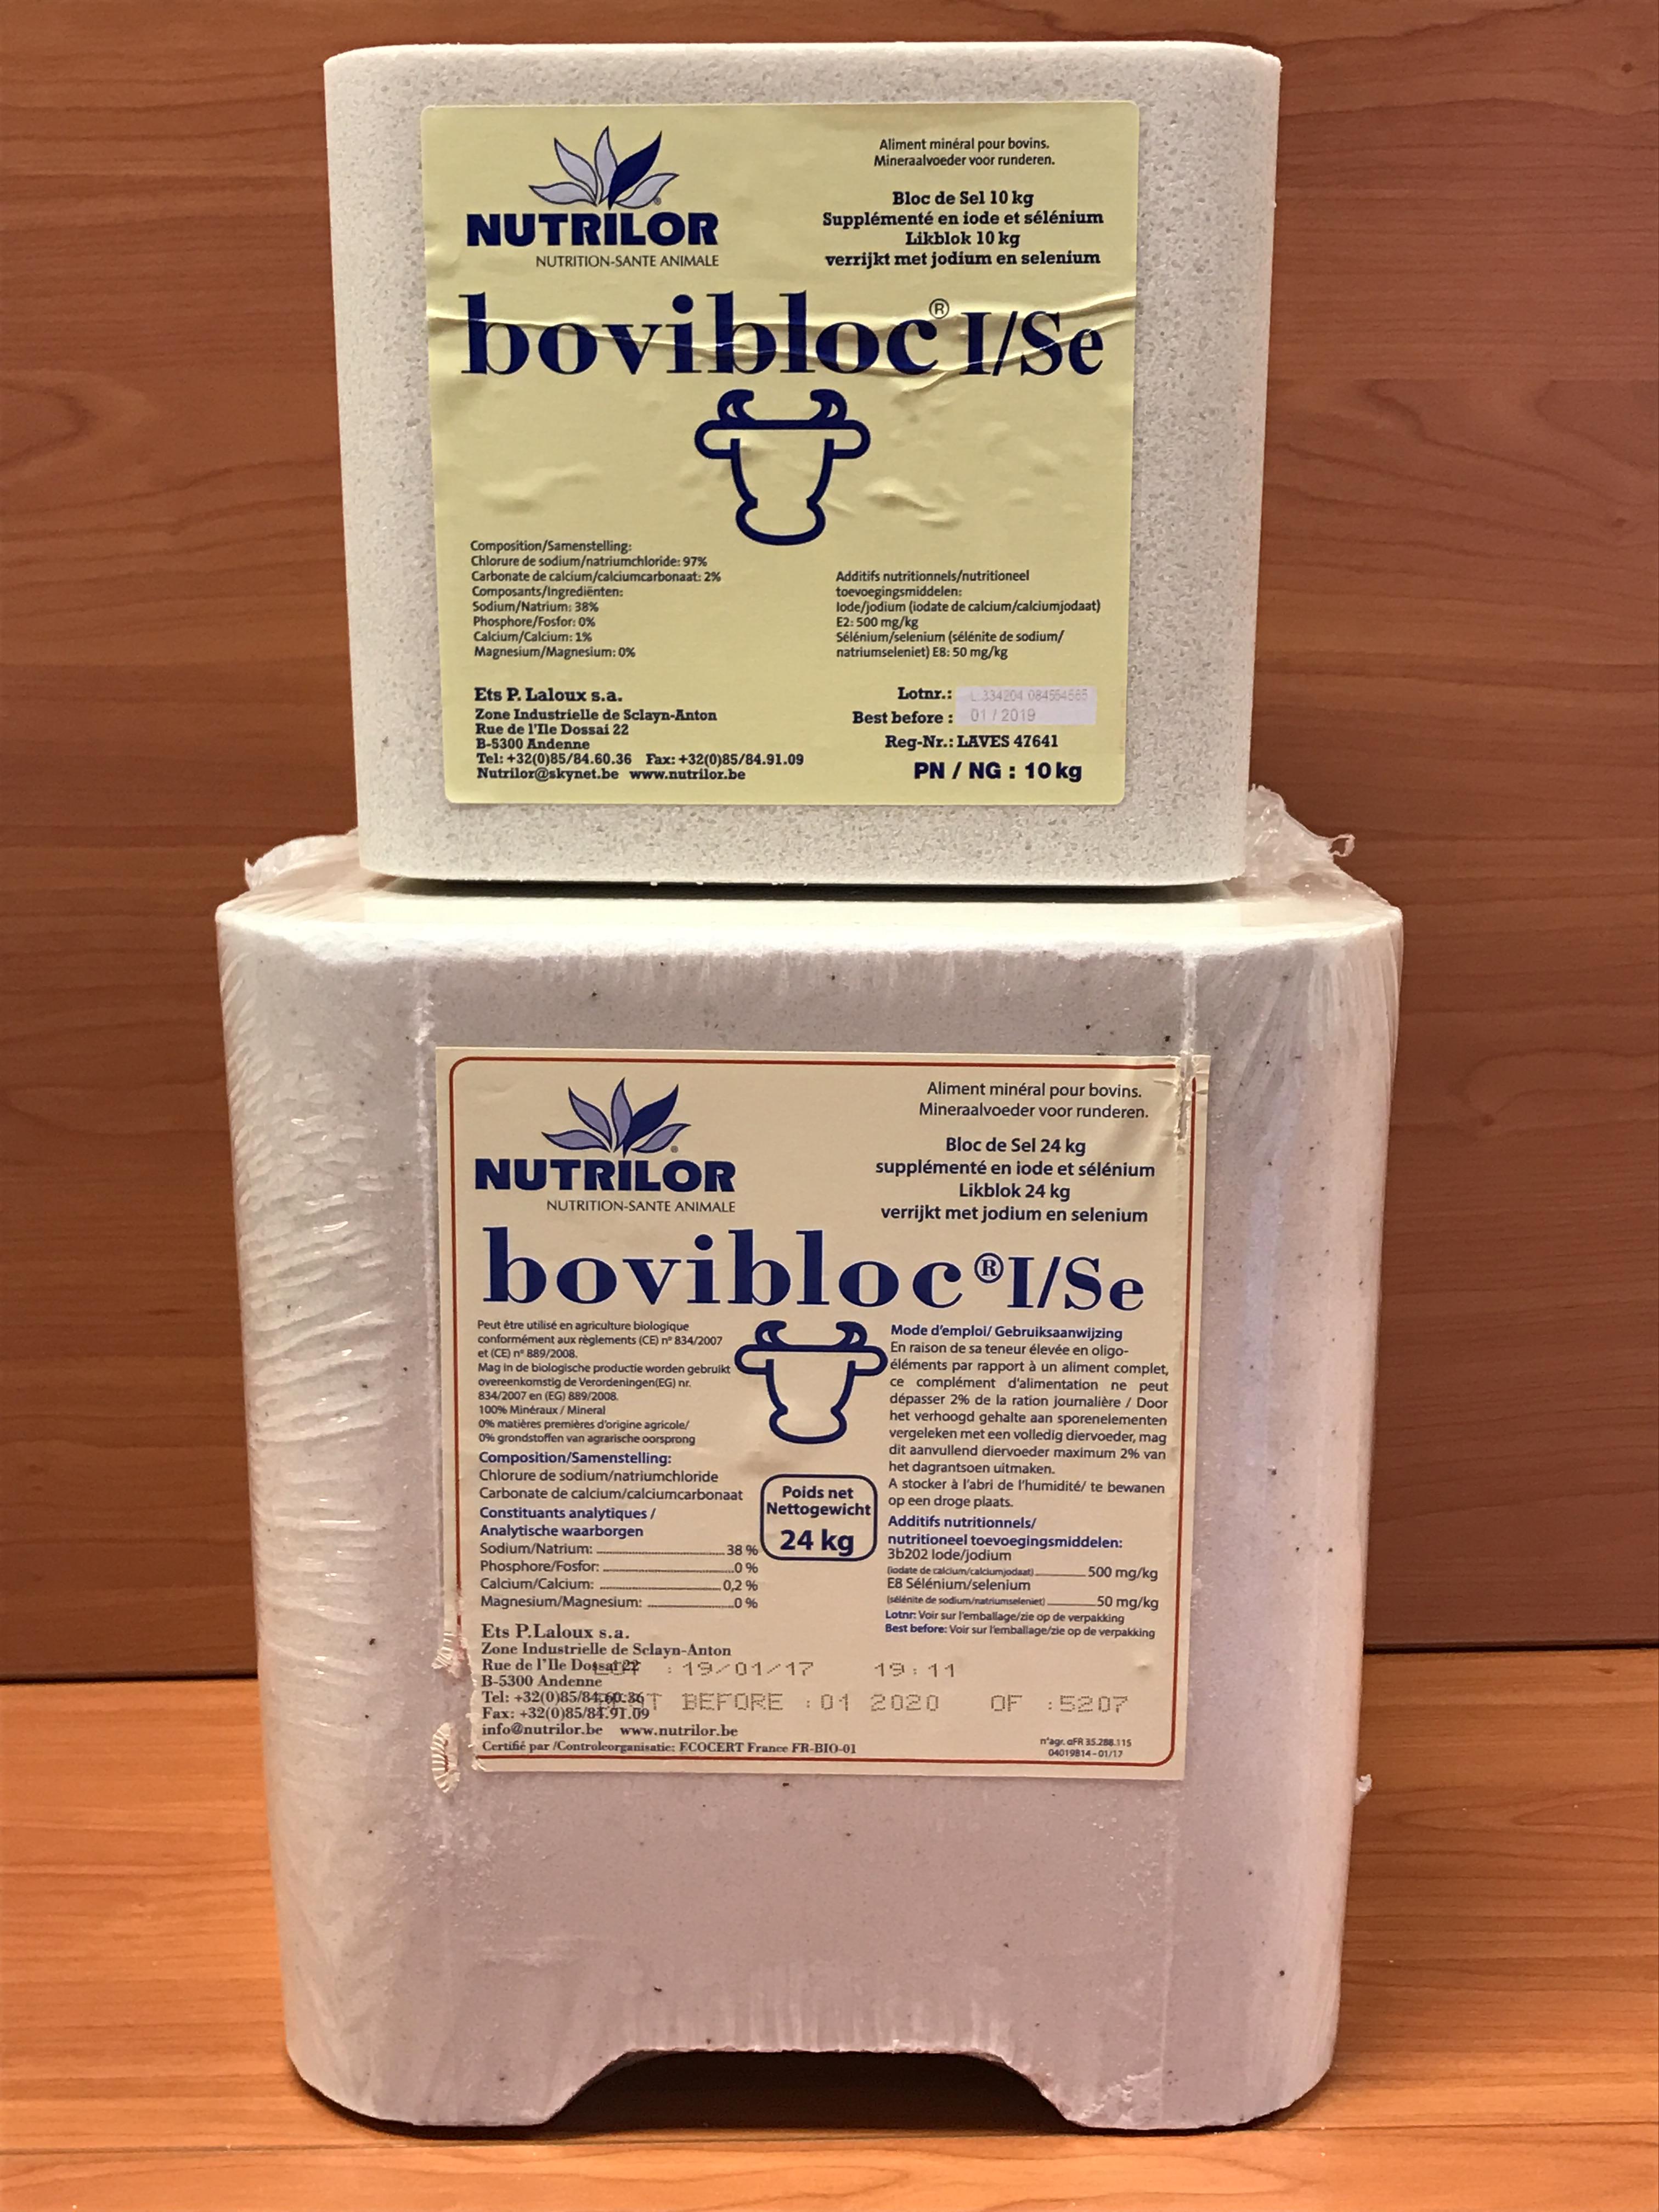 Bovibloc I/Se Nutrilor